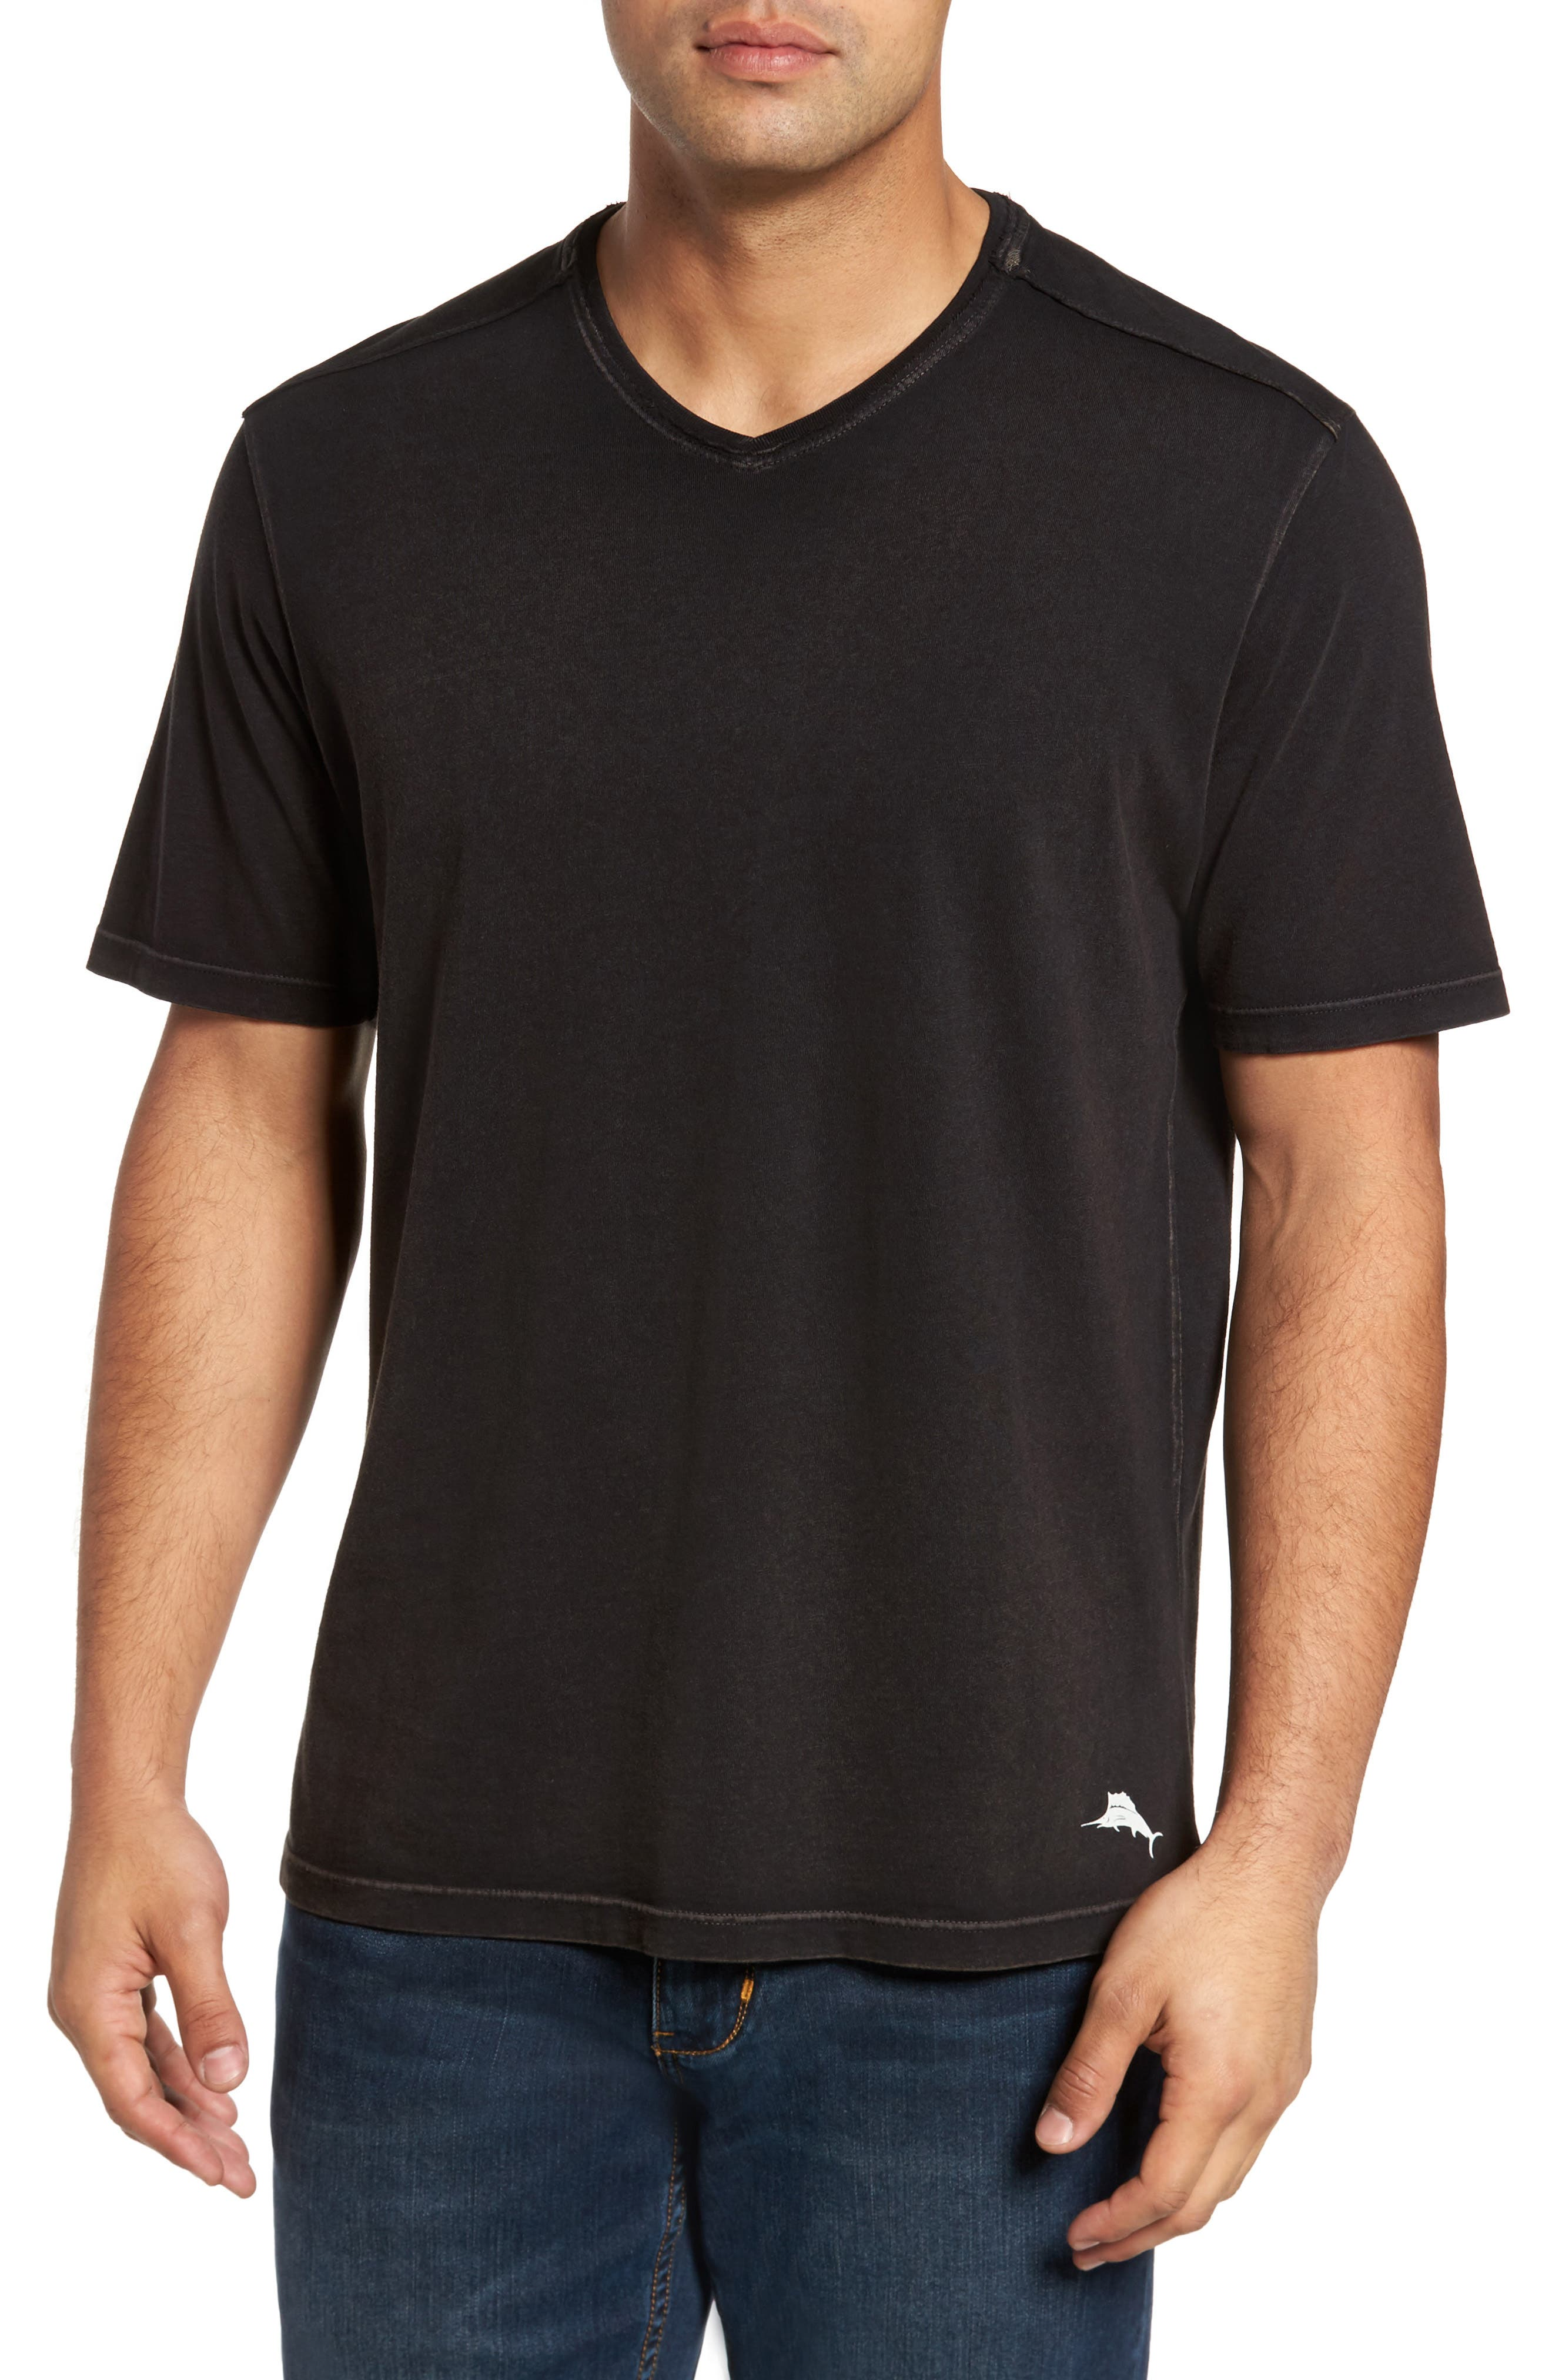 Tommy Bahama 'Kahuna' Short Sleeve V-Neck T-Shirt